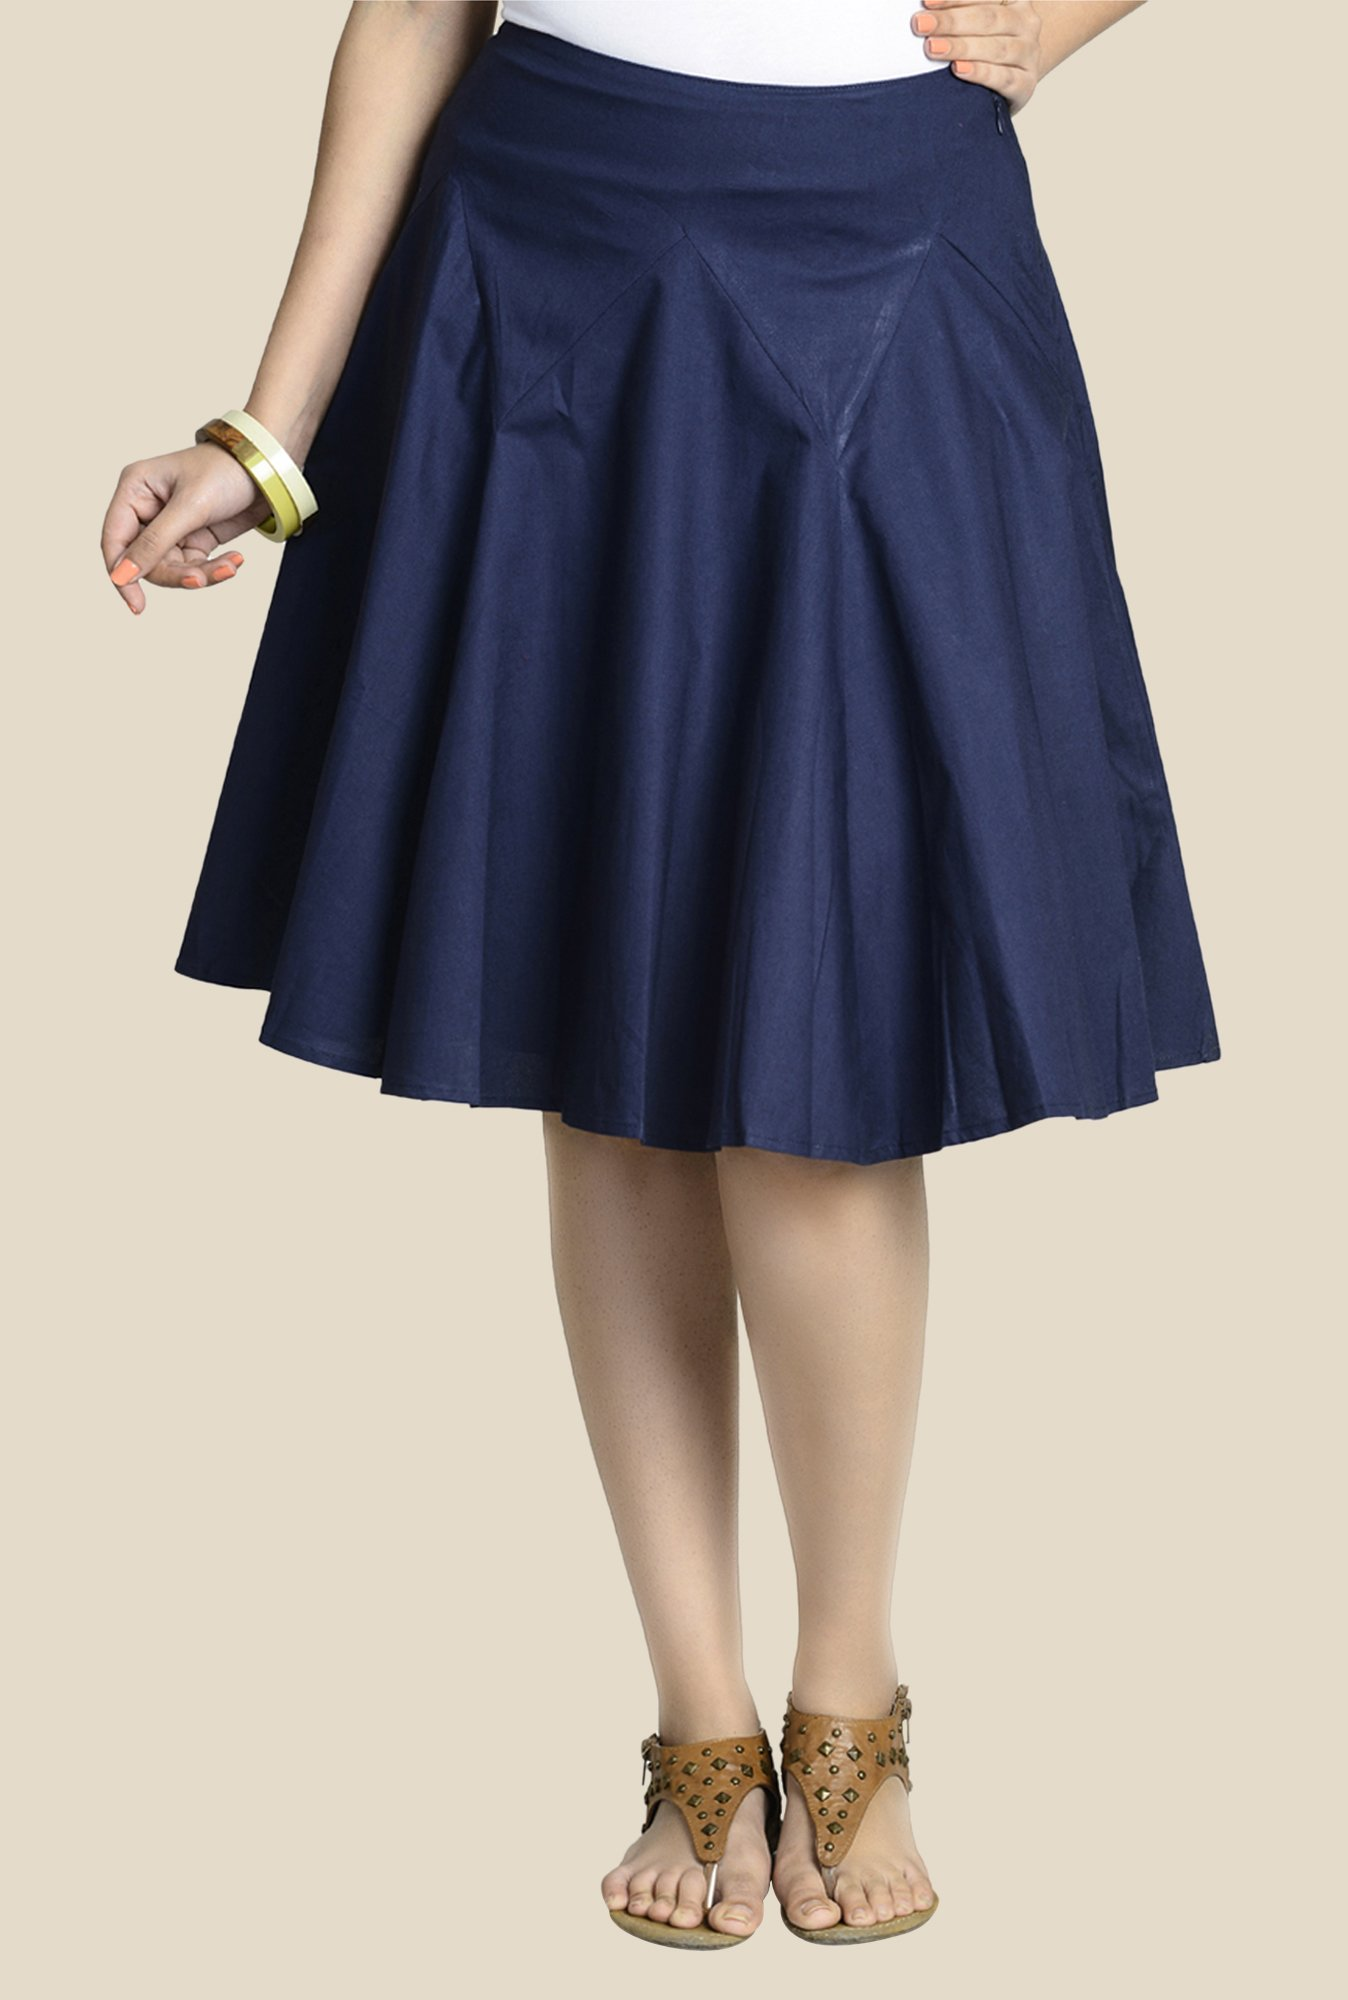 4669037cc Long Skirts Online Fabindia – DACC